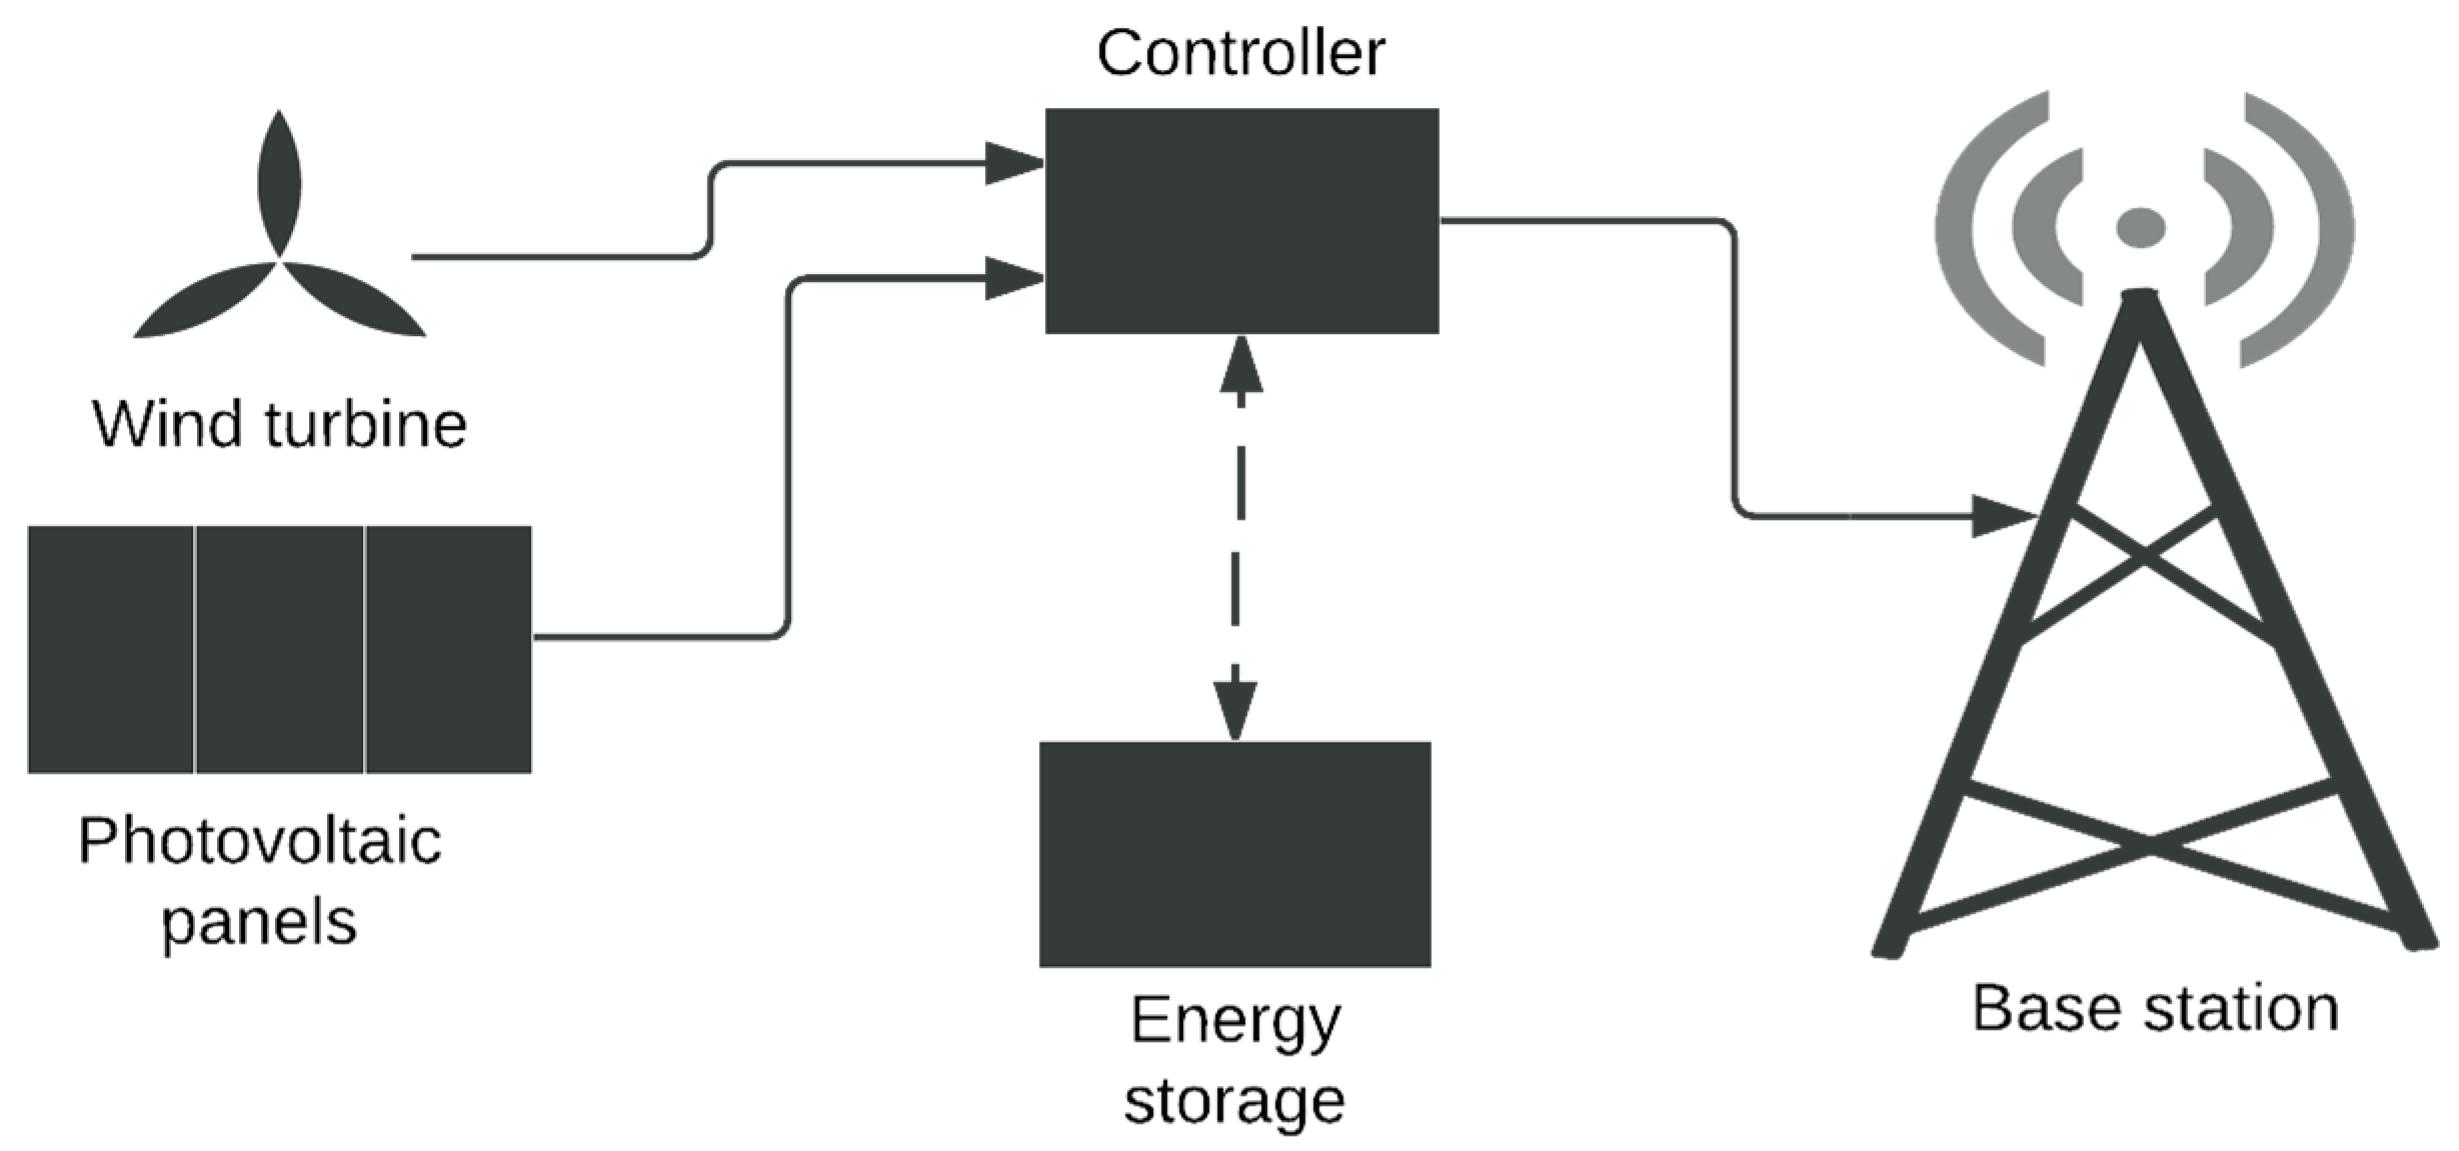 Ys Wind Turbine System Block Diagram Sma Sunny